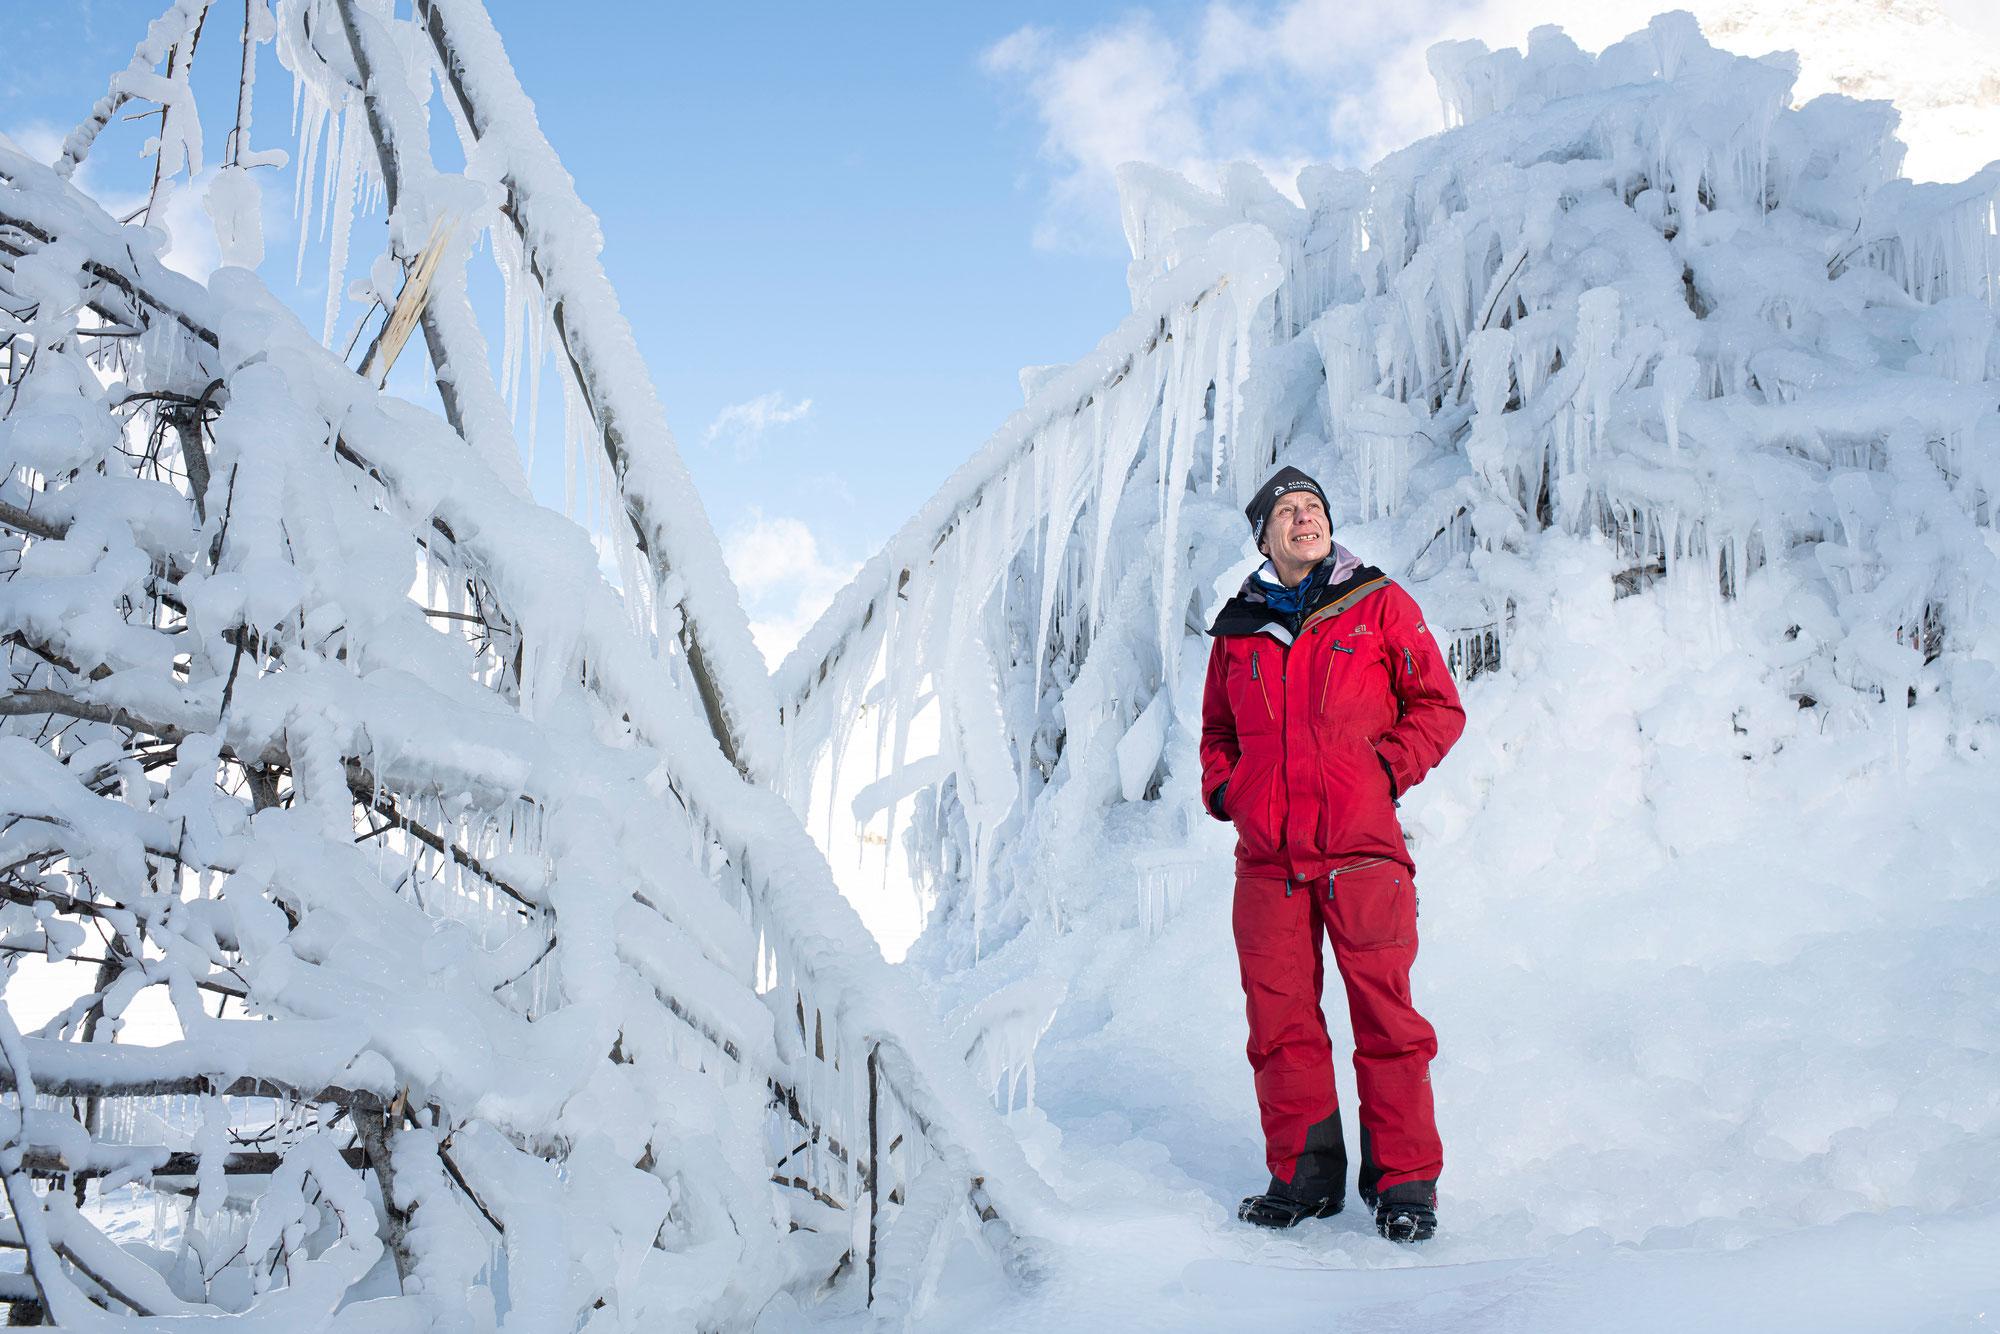 Gletscherprojekt MortAlive